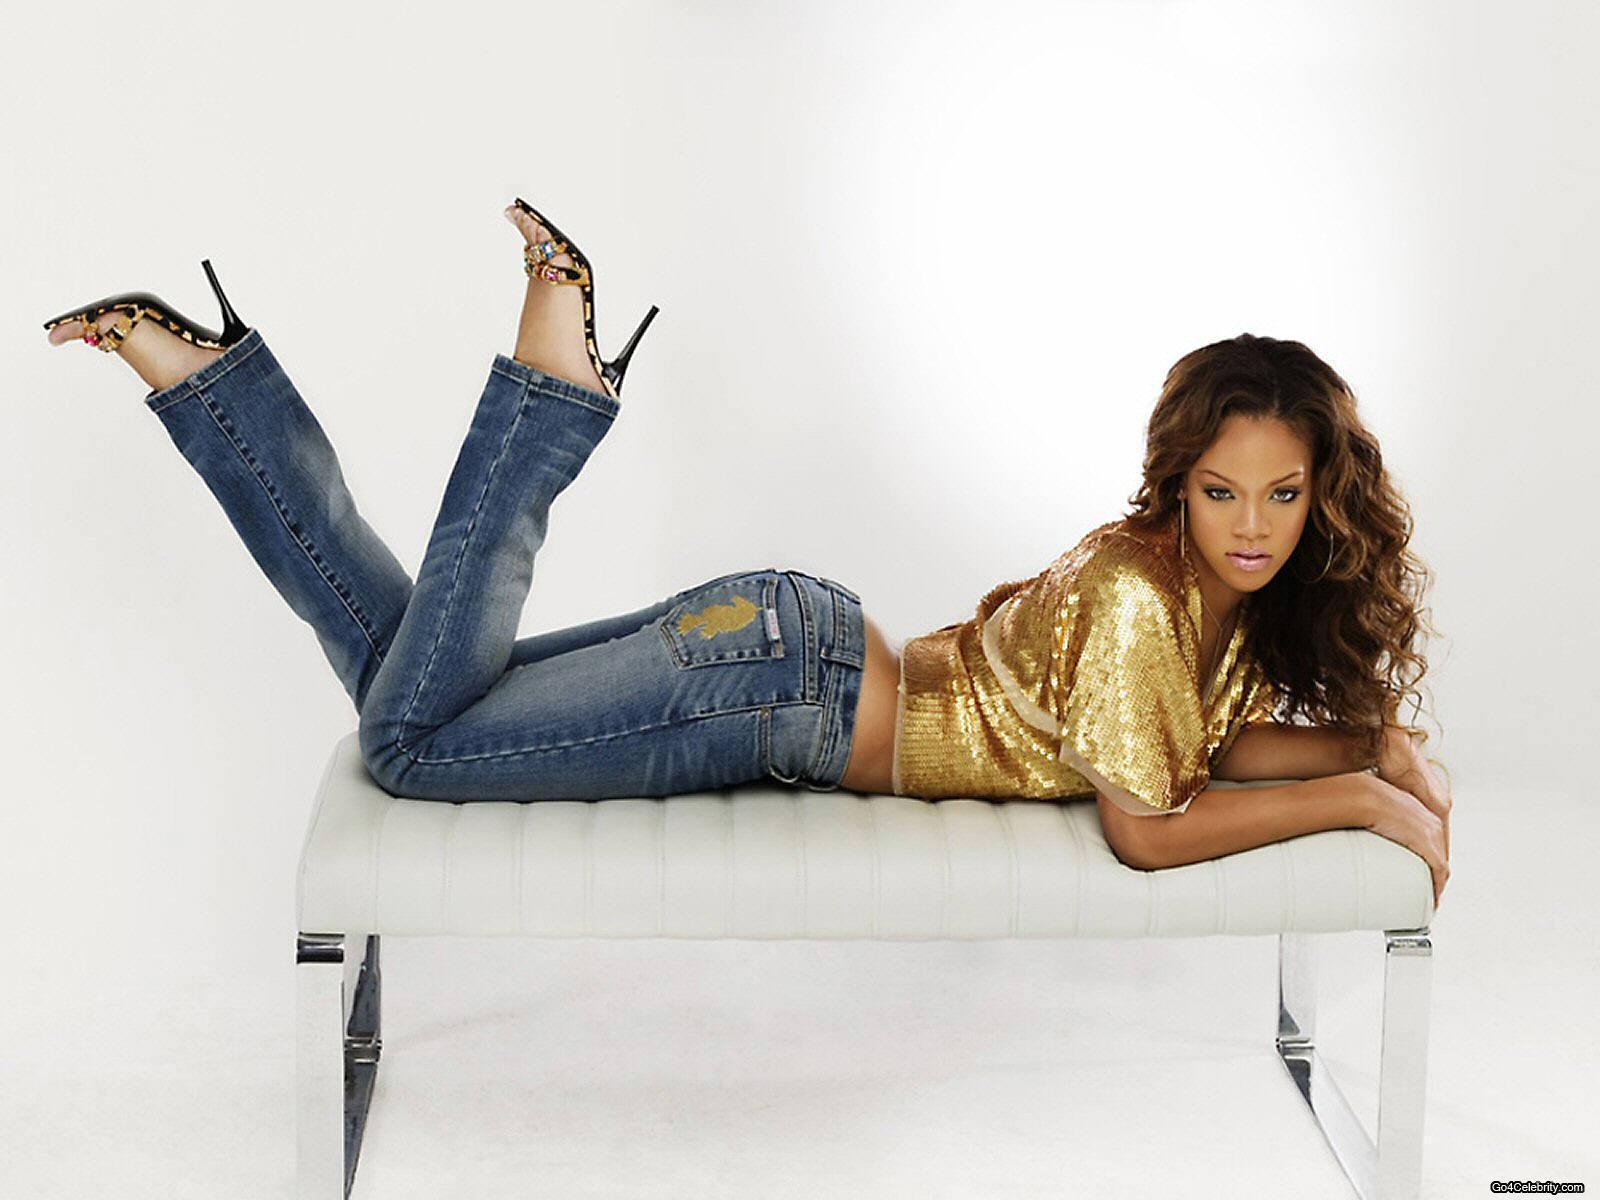 http://images2.fanpop.com/images/photos/6800000/Rihanna-rihanna-6848170-1600-1200.jpg